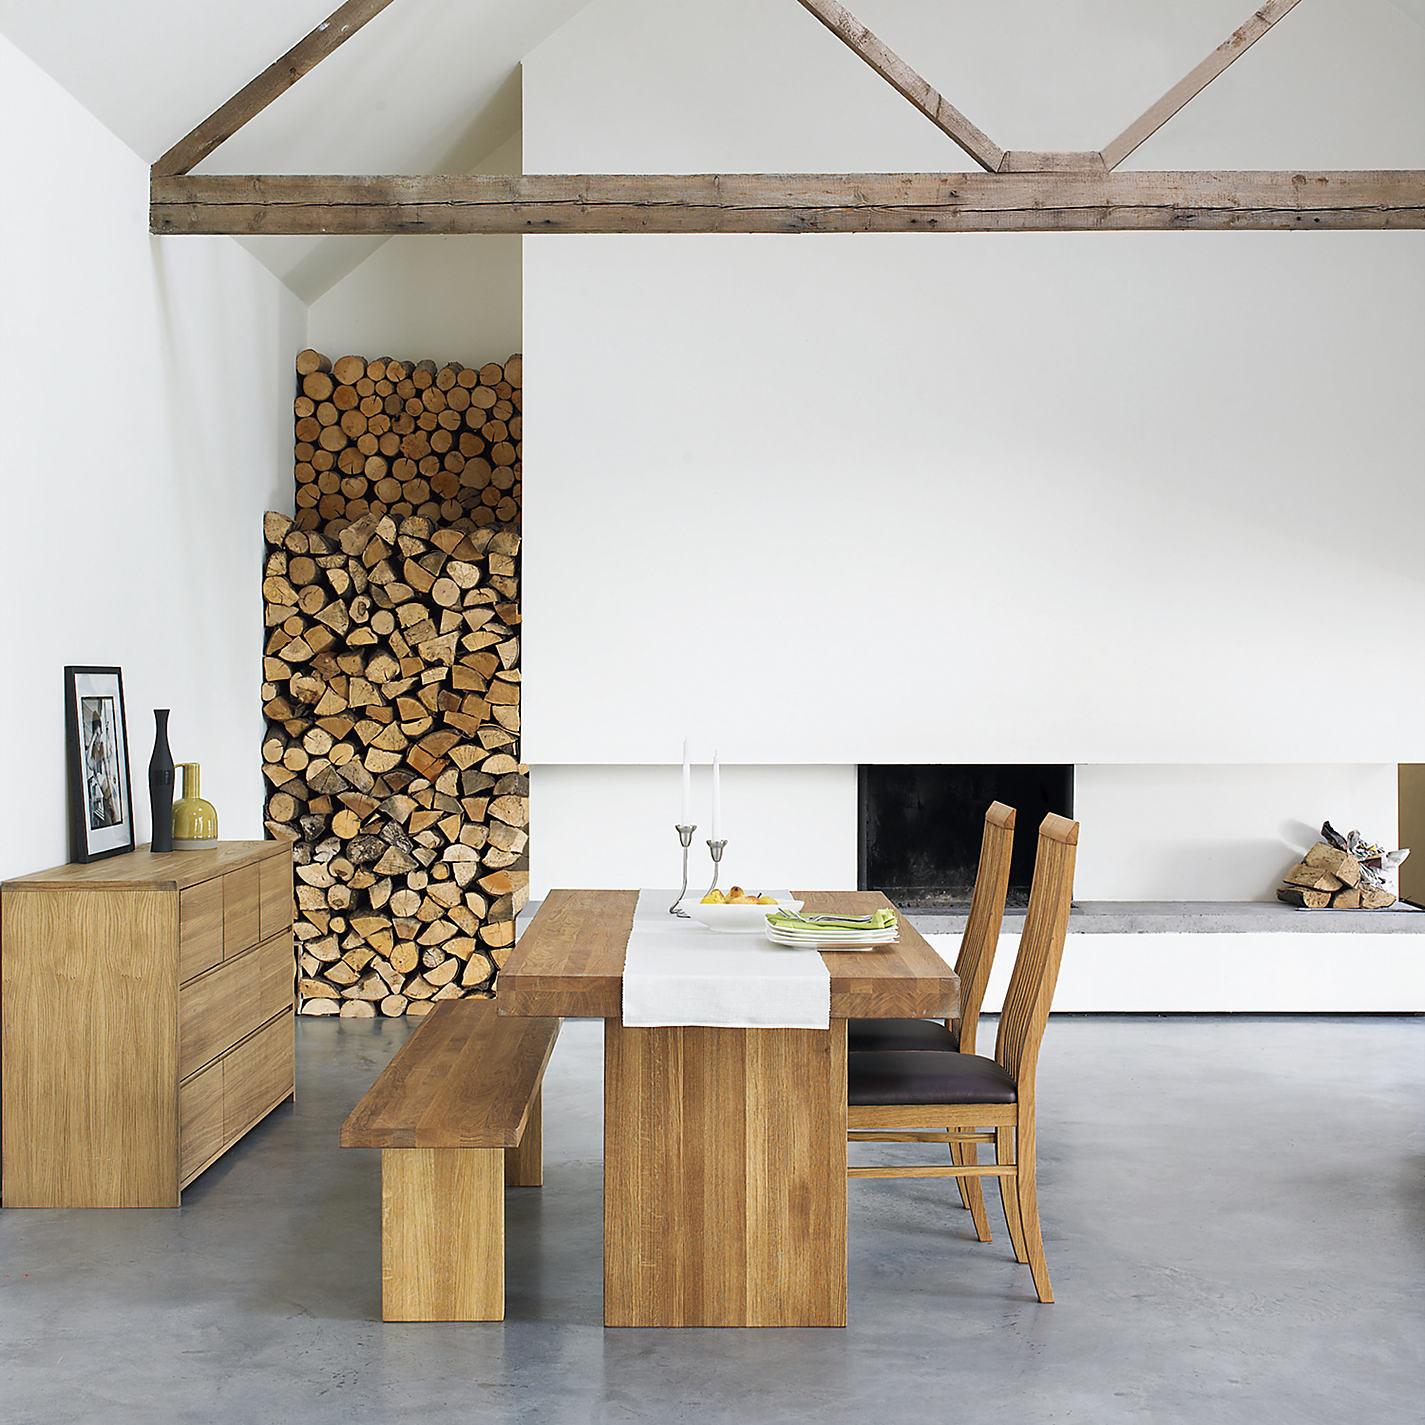 Living Room Furniture John Lewis buy john lewis henry living & dining room furniture | john lewis